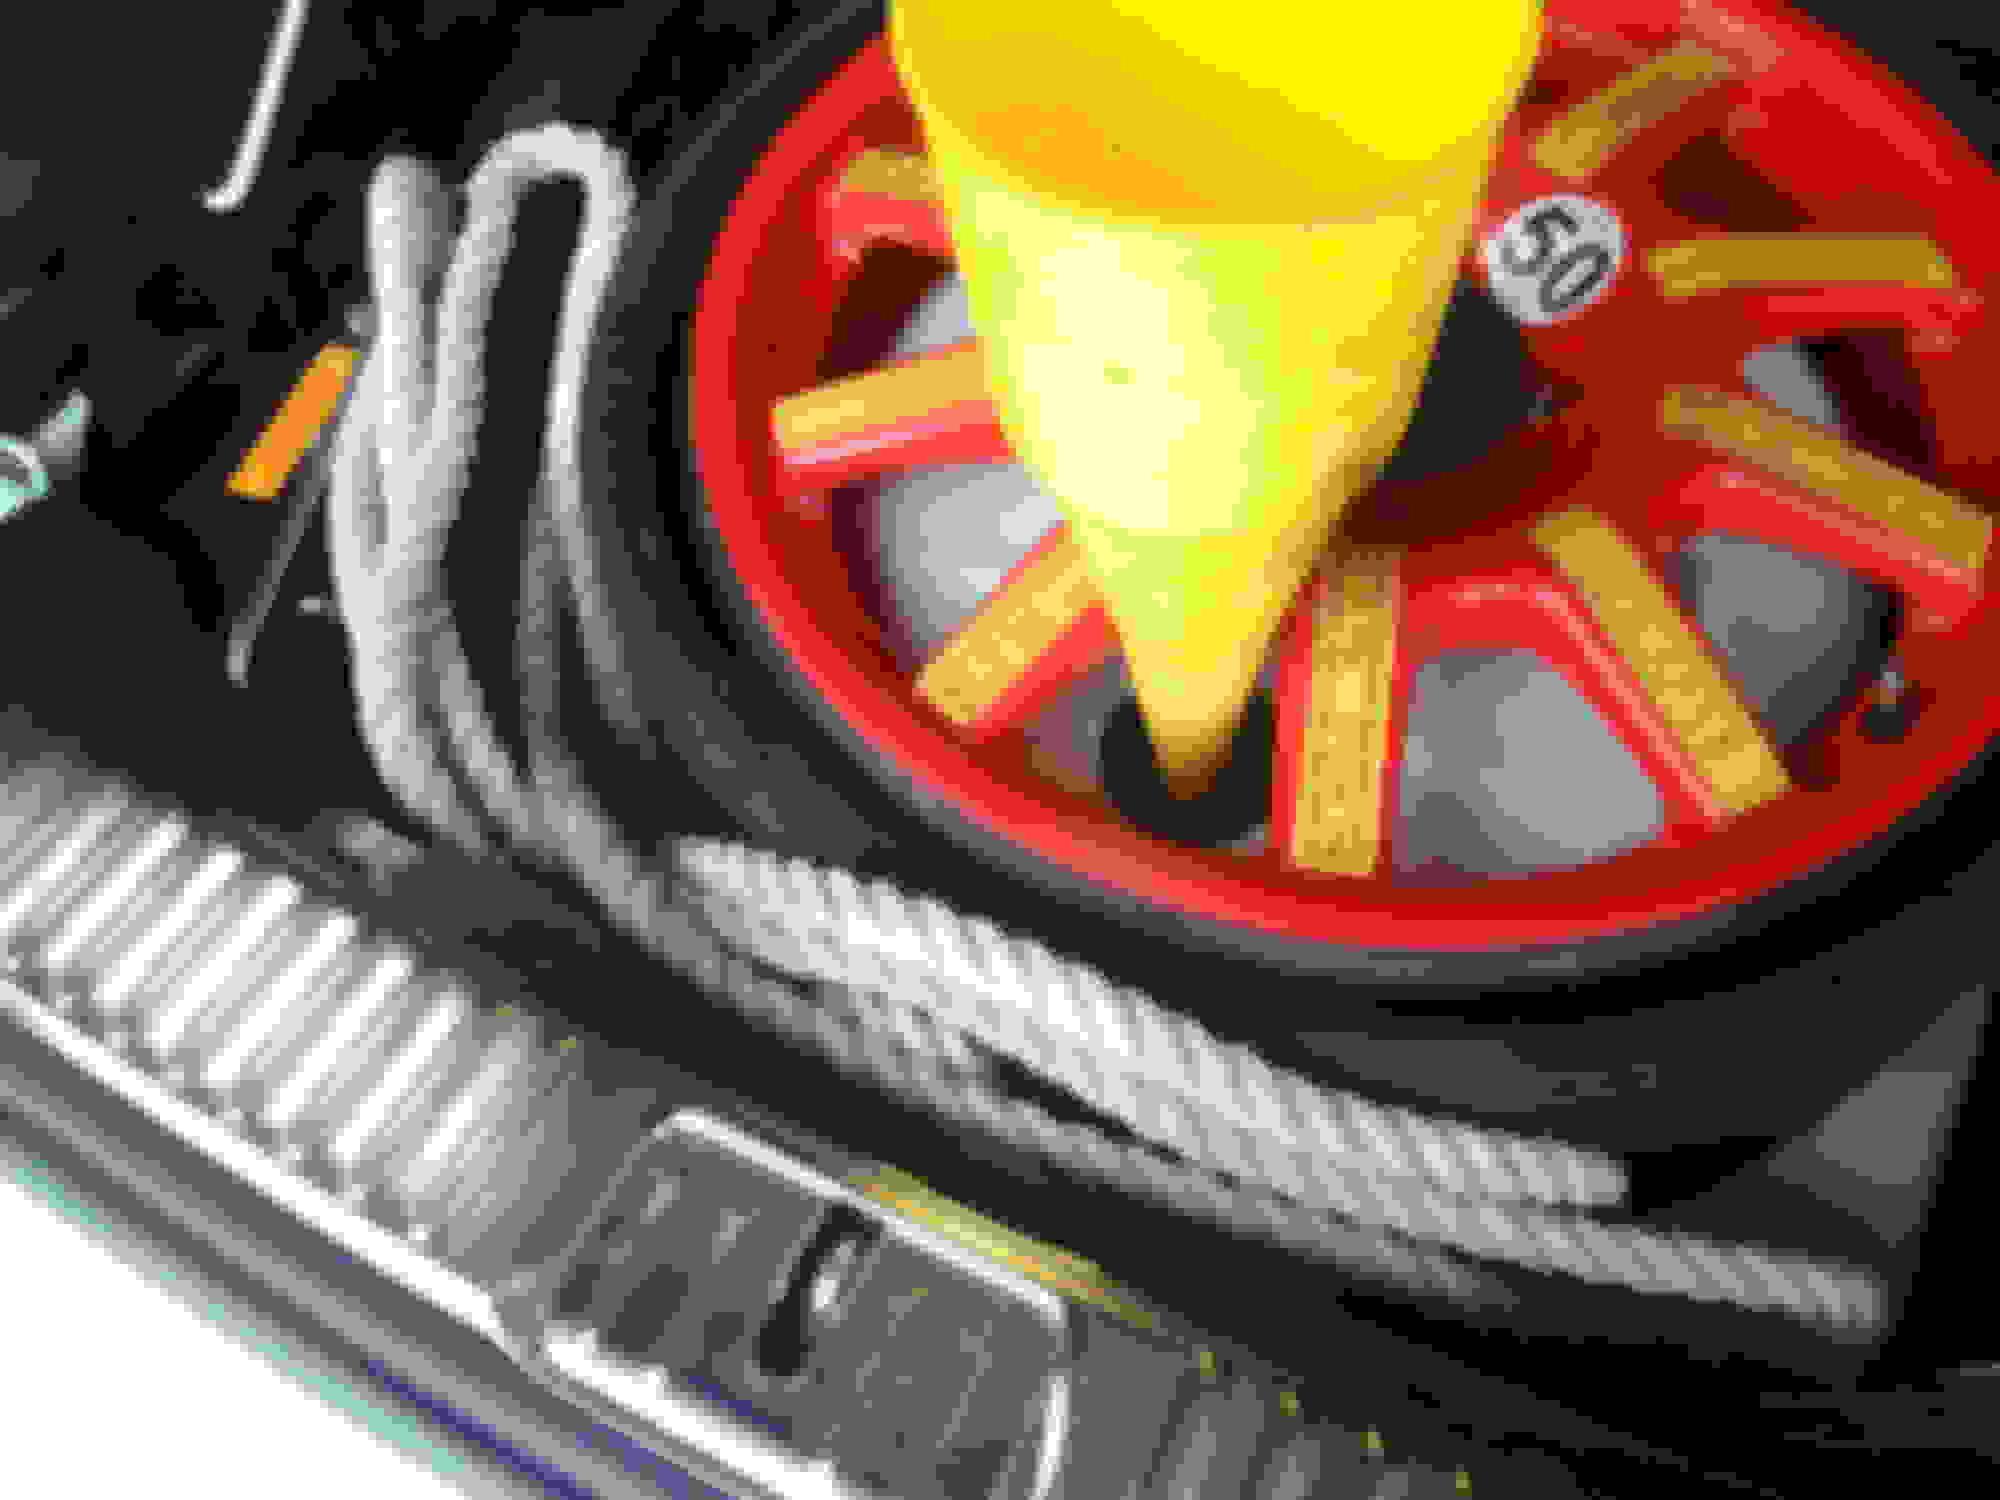 958 Cayenne DIY: Filling diesel exhaust fluid (DEF) tank